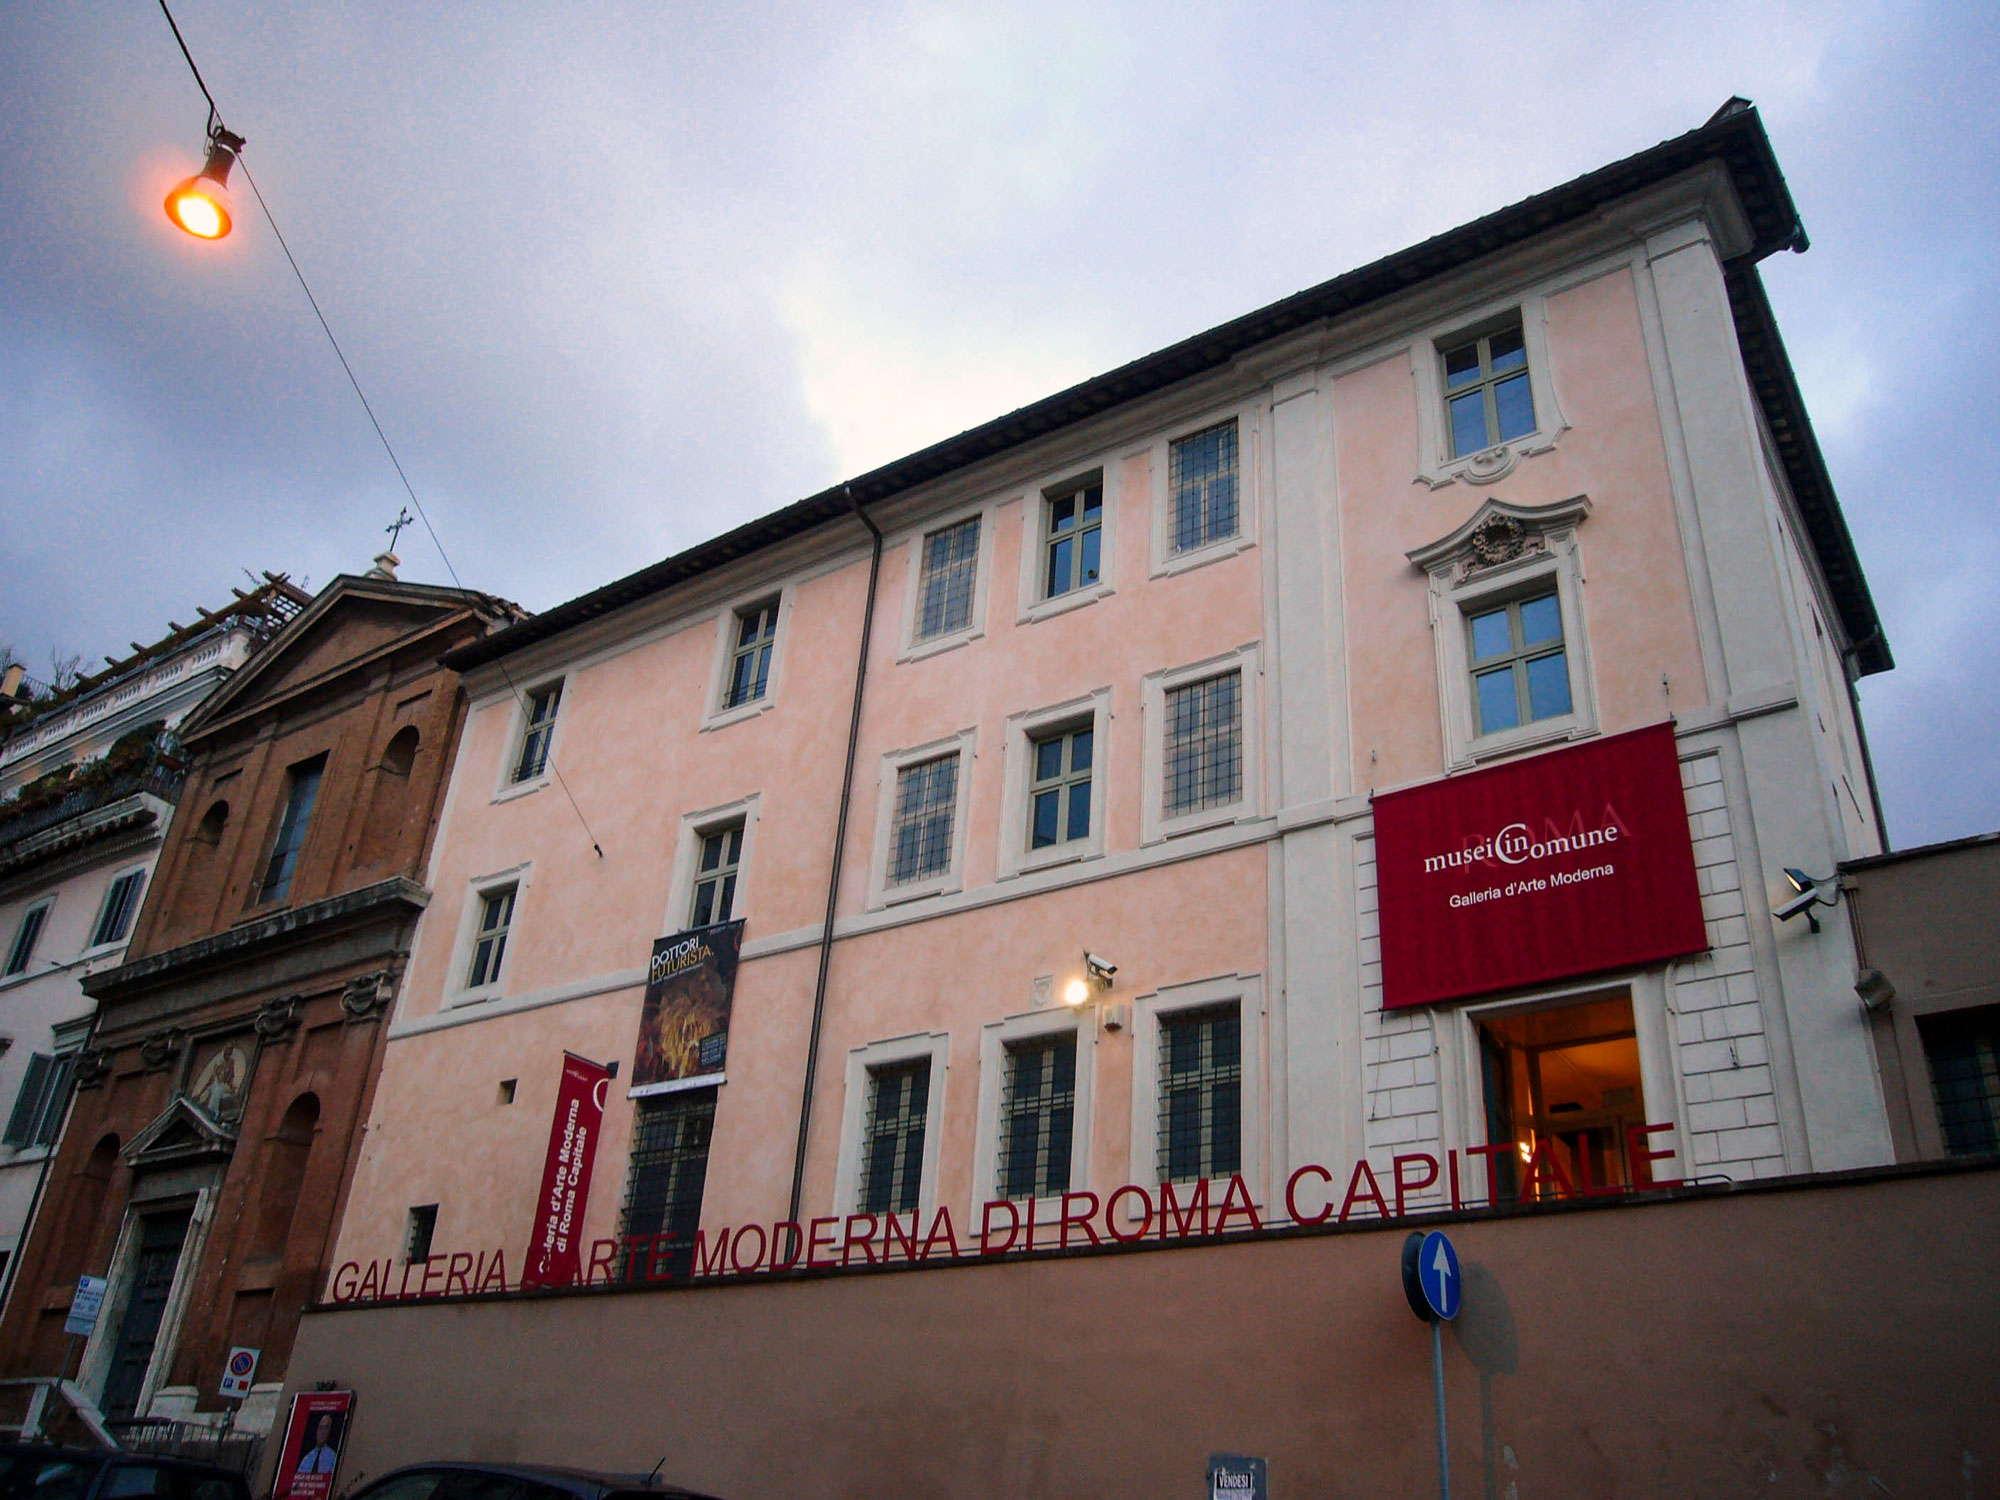 Galleria d'arte moderna comunale Roma